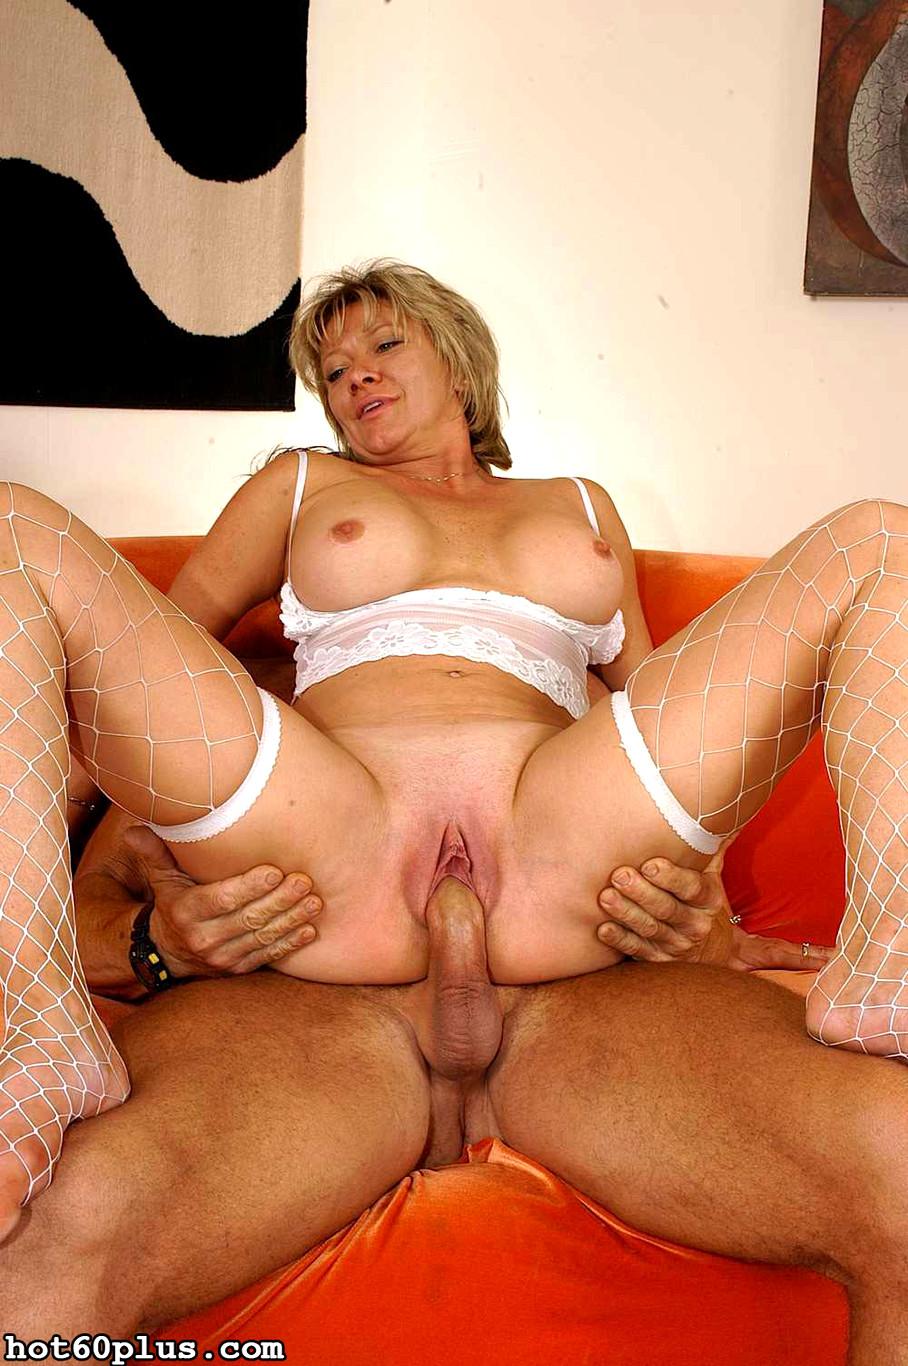 Фото секса теть, трахал узкие ножки